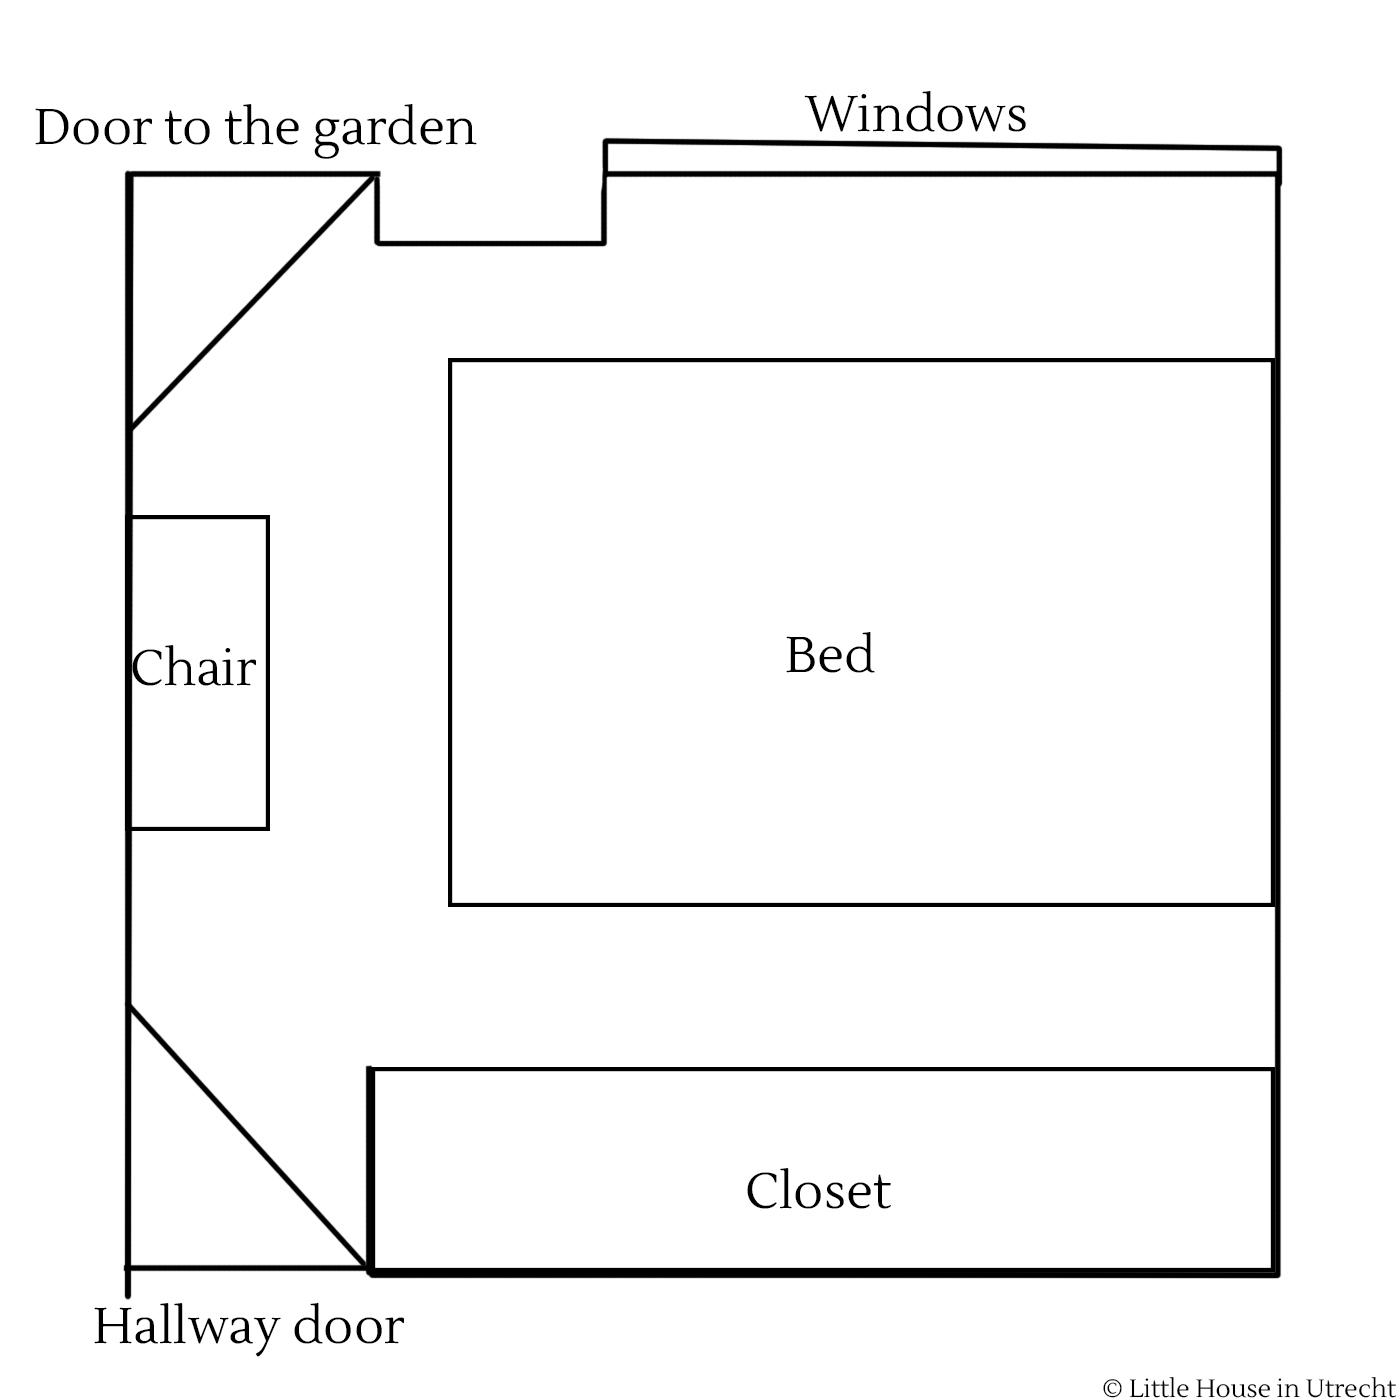 tiny bedroom layout, little house in utrecht